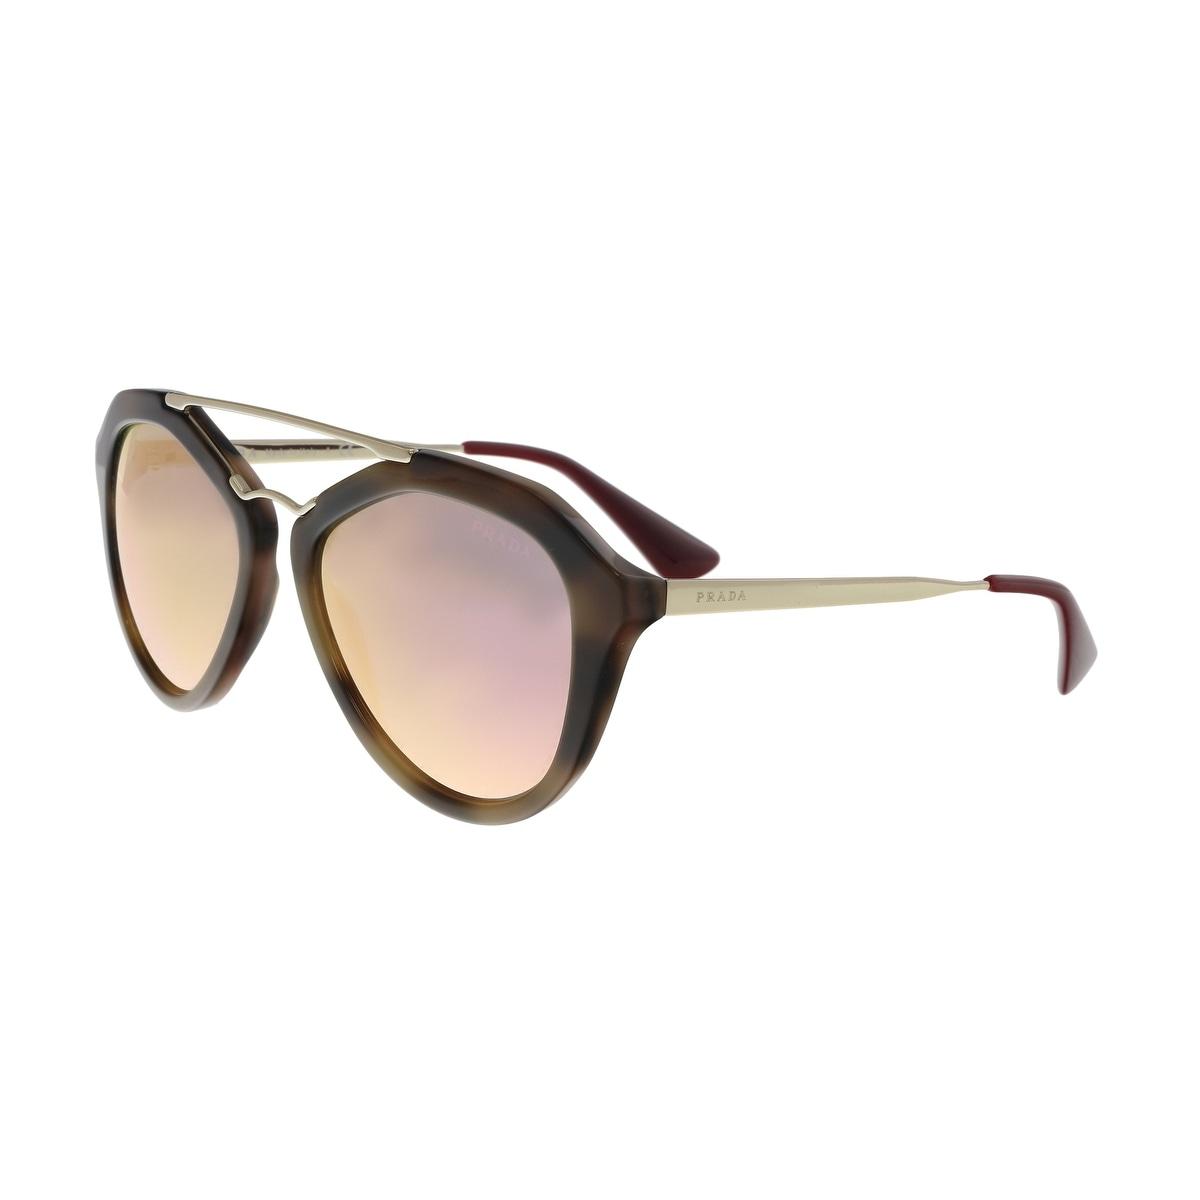 c0bd3489f27 Prada Sunglasses